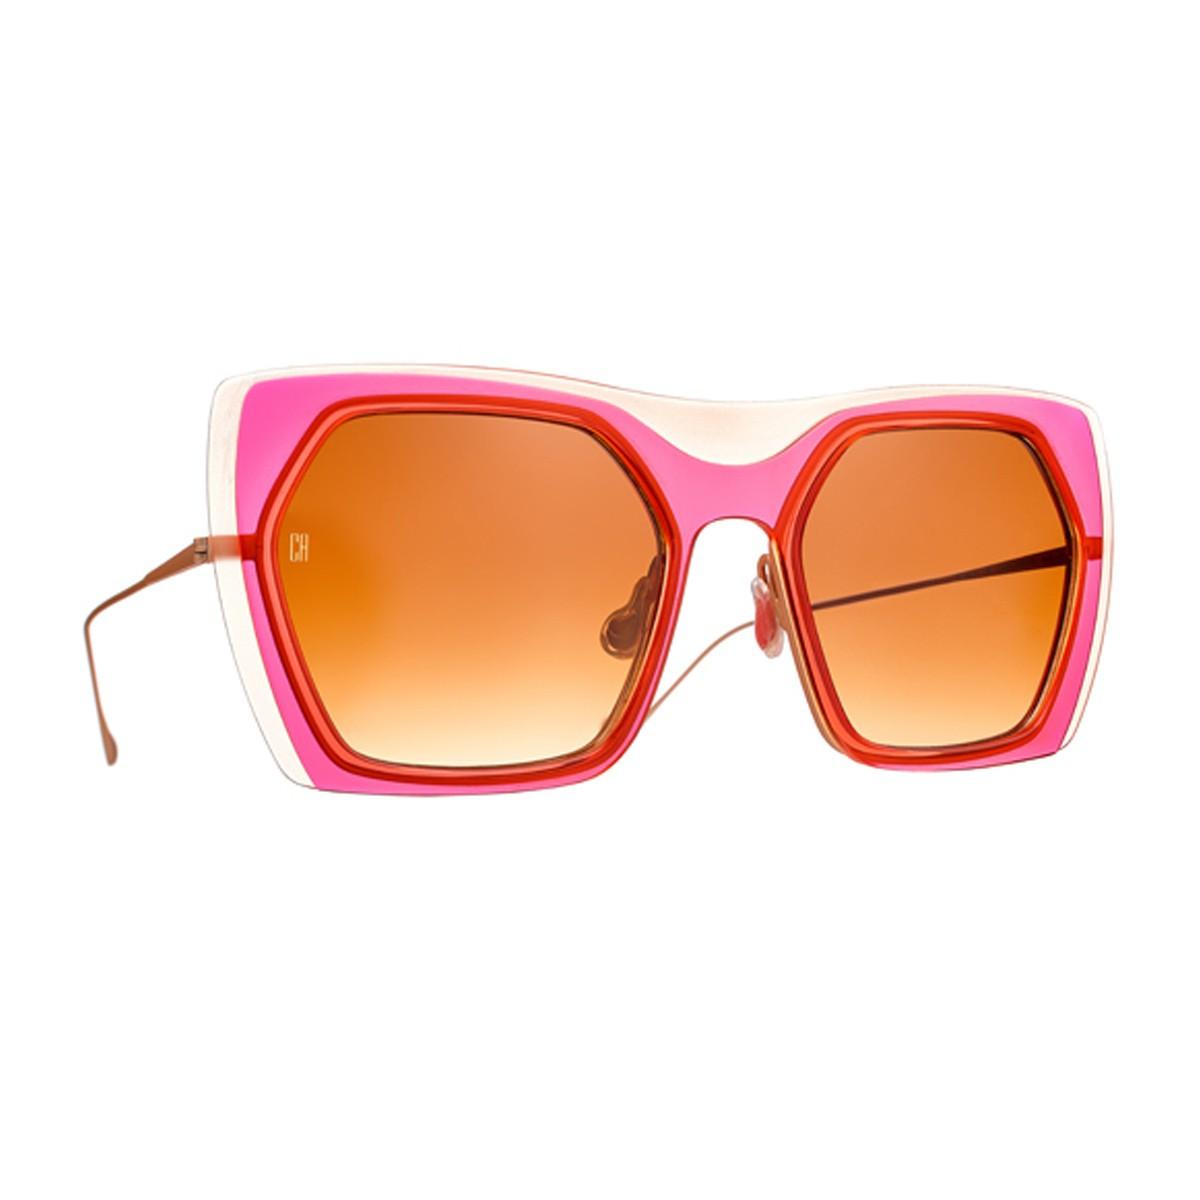 Caroline Abram Dangereuse   Women's sunglasses